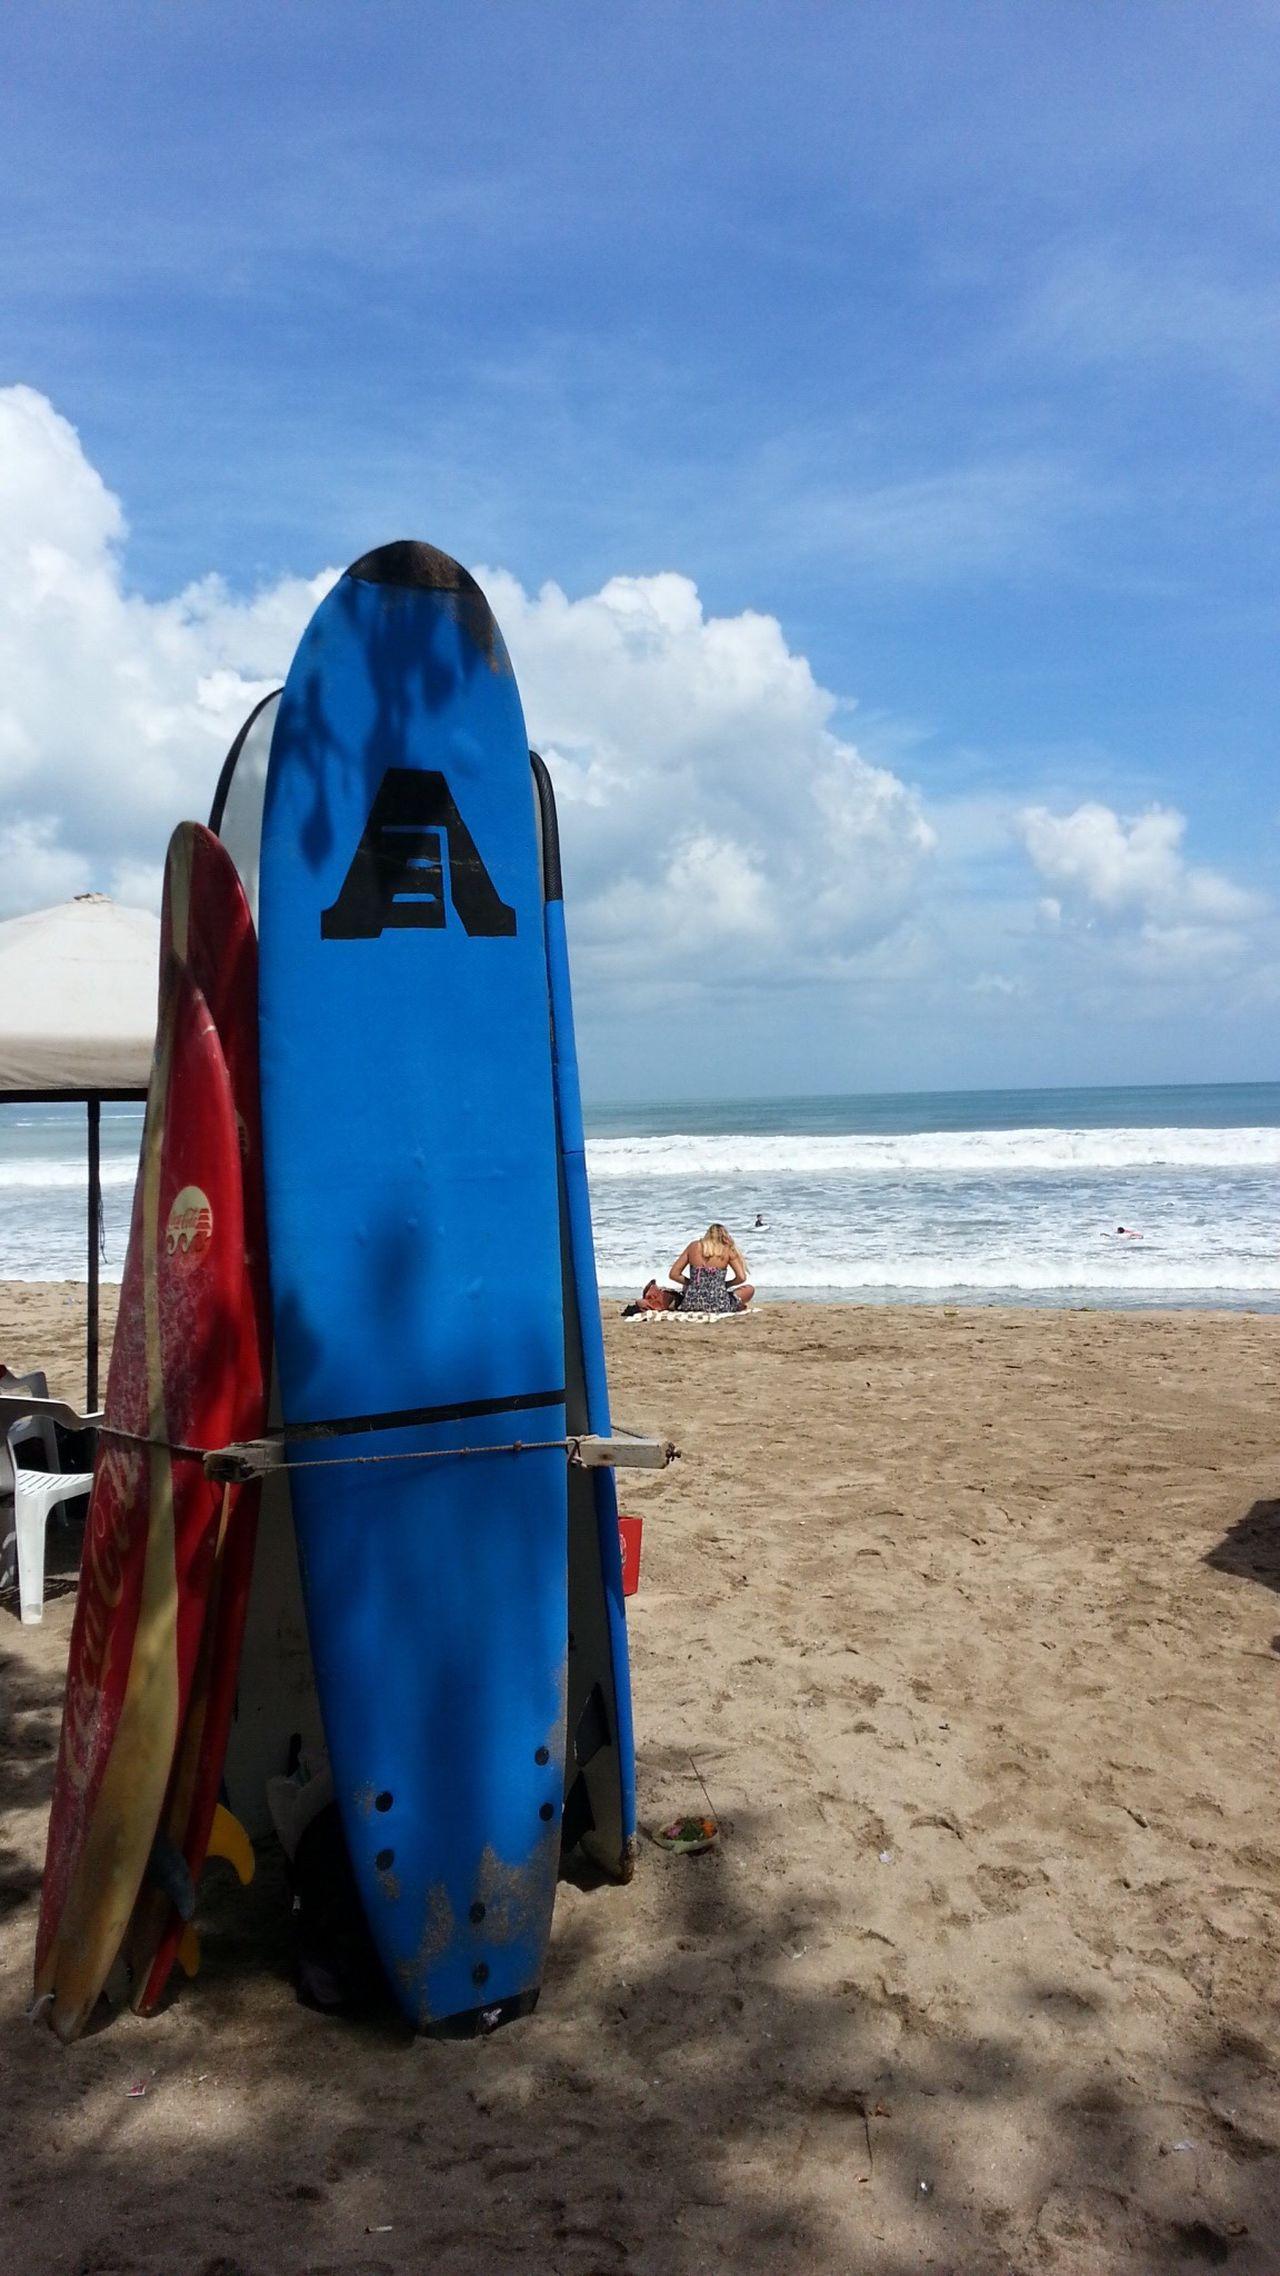 Surf Board Beach Cloud - Sky Horizon Over Water Outdoors Vacations Sand Sea Sky